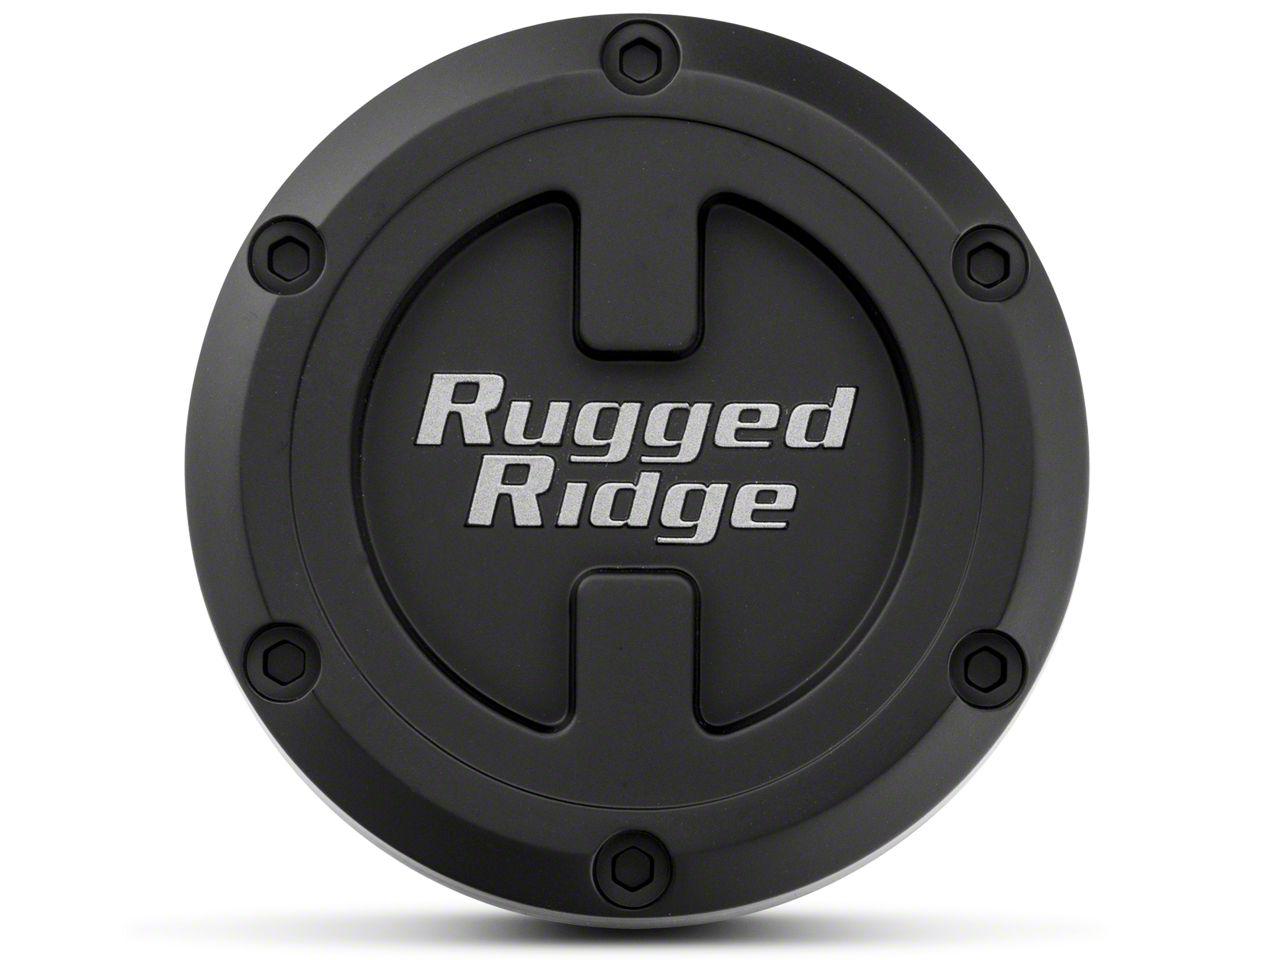 Rugged Ridge 17x9 XHD Wheel Center Cap - Black (07-19 Jeep Wrangler JK & JL)